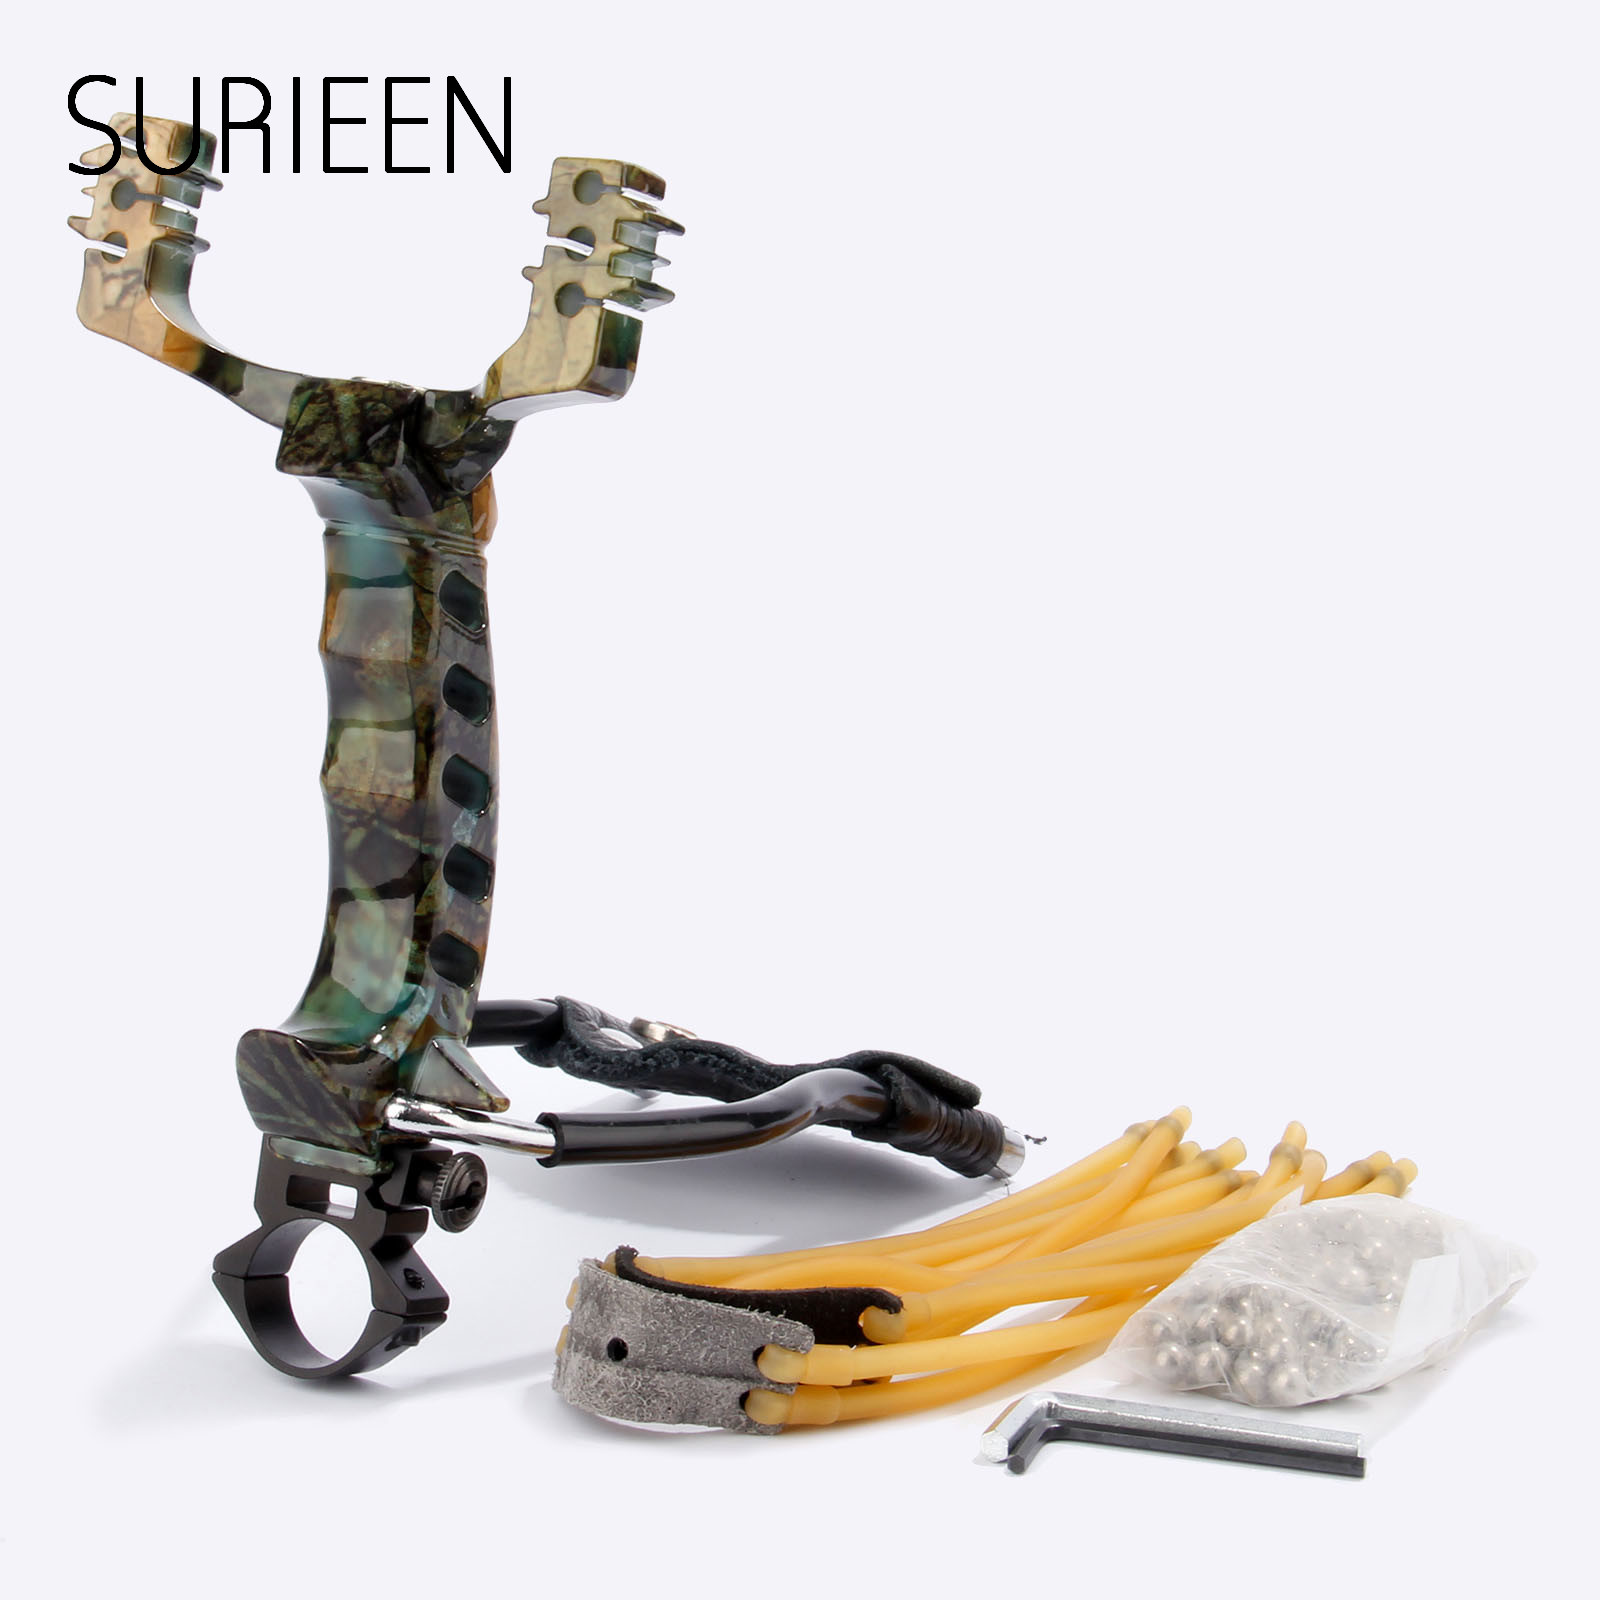 SURIEEN High Velocity Hunting Sling Shot Slingshots Catapult W/ Wrist Brace+Rubber Bands+Steel Balls Arrow Rest Flashlight Clamp